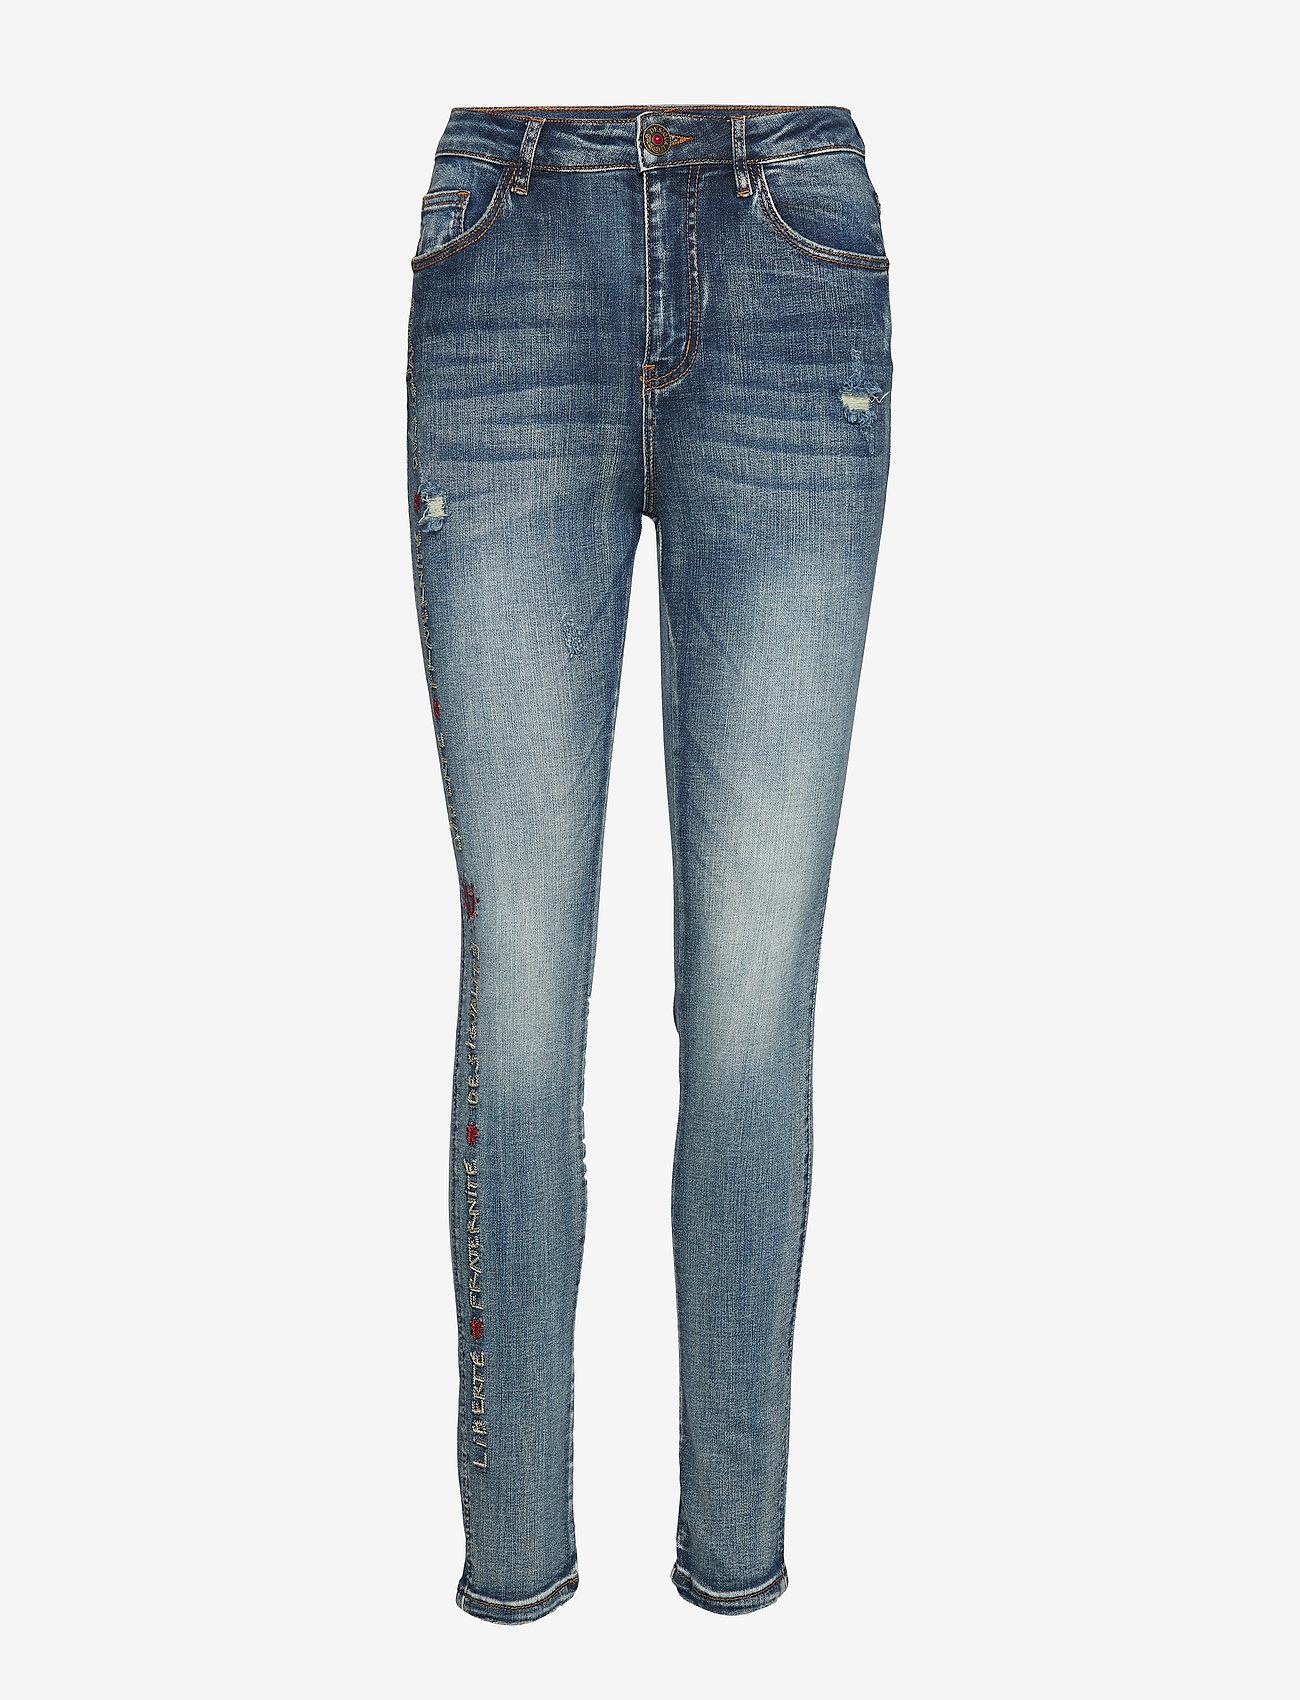 Desigual - DENIM FRATERNI - jeans skinny - denim baby blue - 0